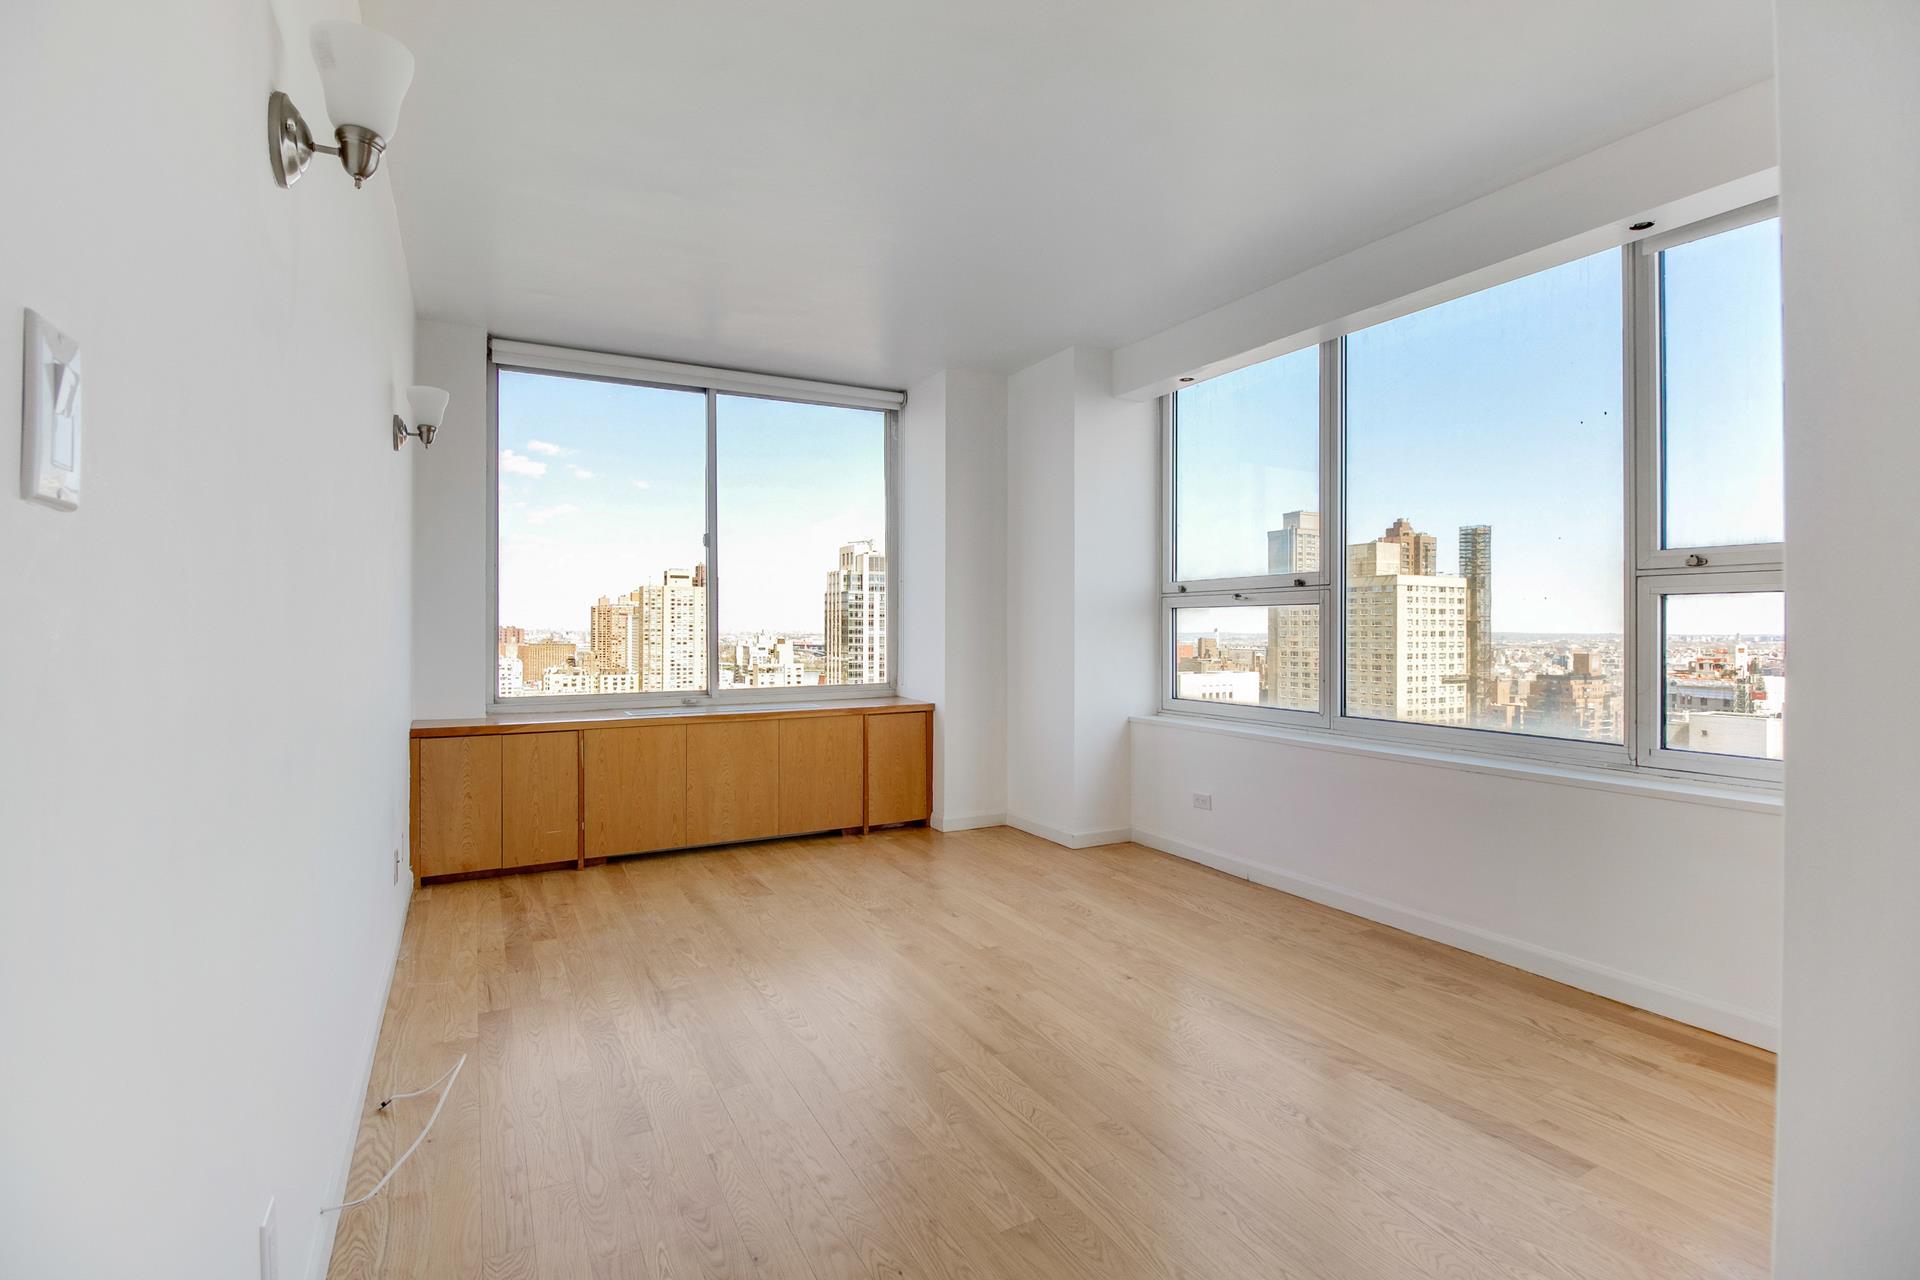 404 East 79th Street Upper East Side New York NY 10075